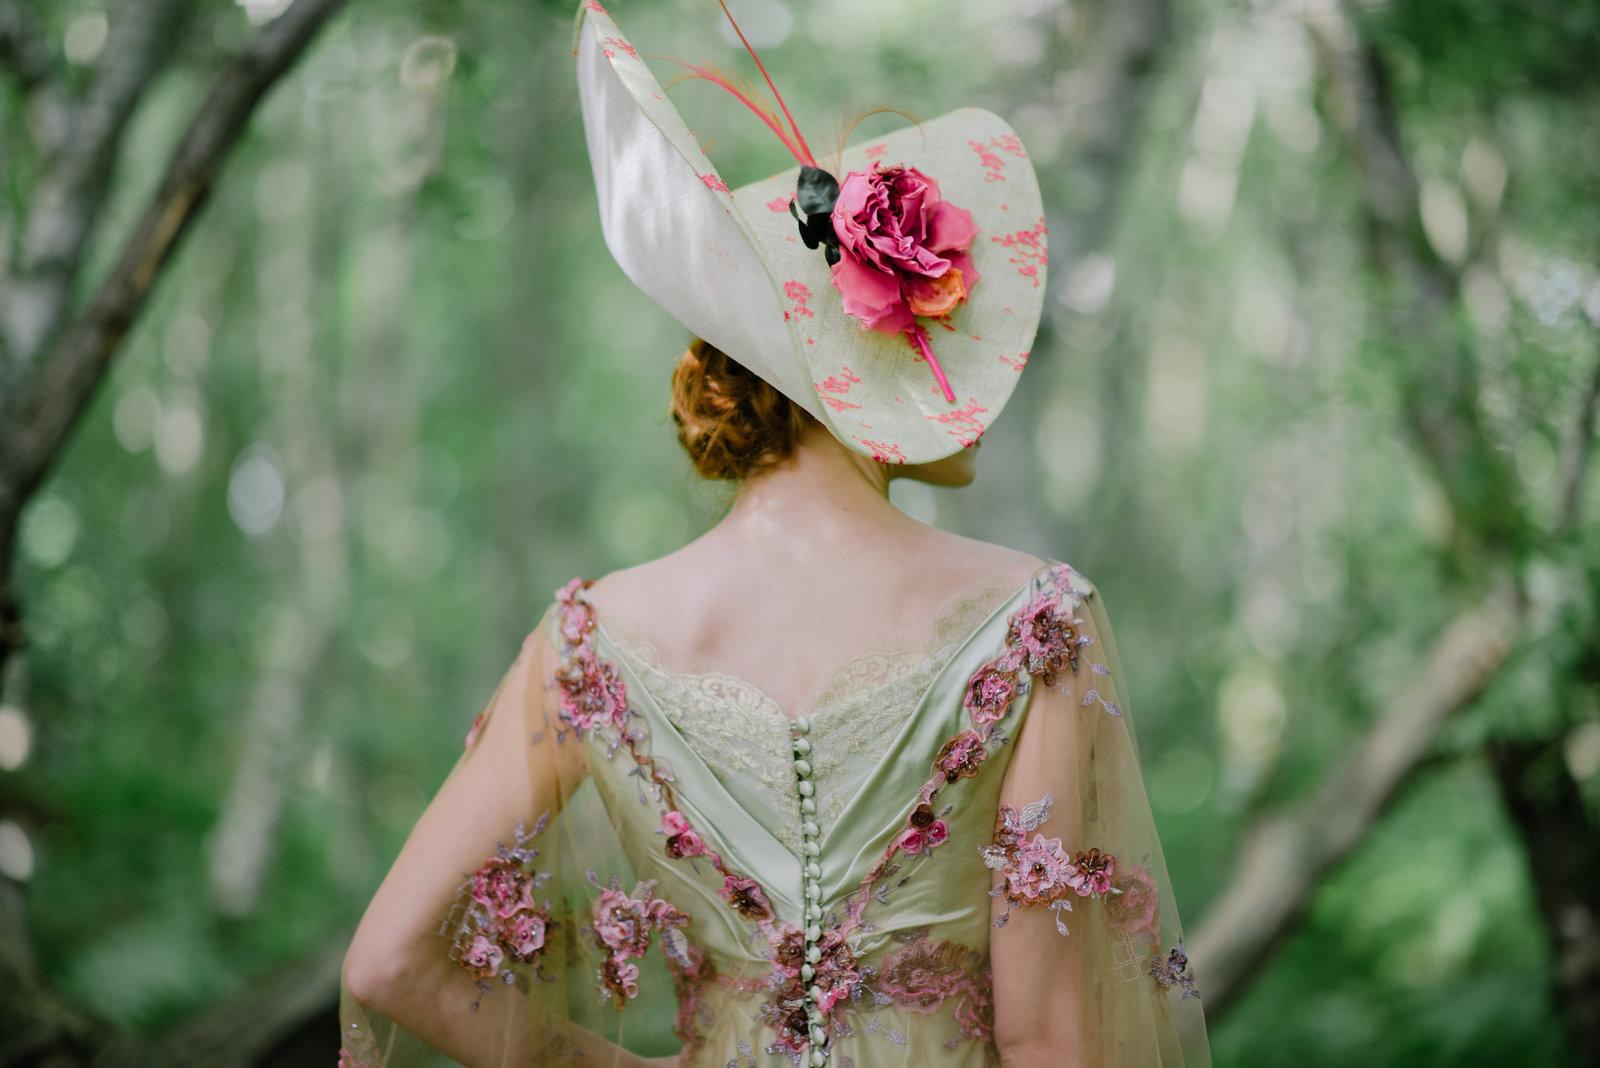 Gainsborough_belle_epoque_green_lilac_wedding_dress_JoanneFlemingDesign_JMS (10)web